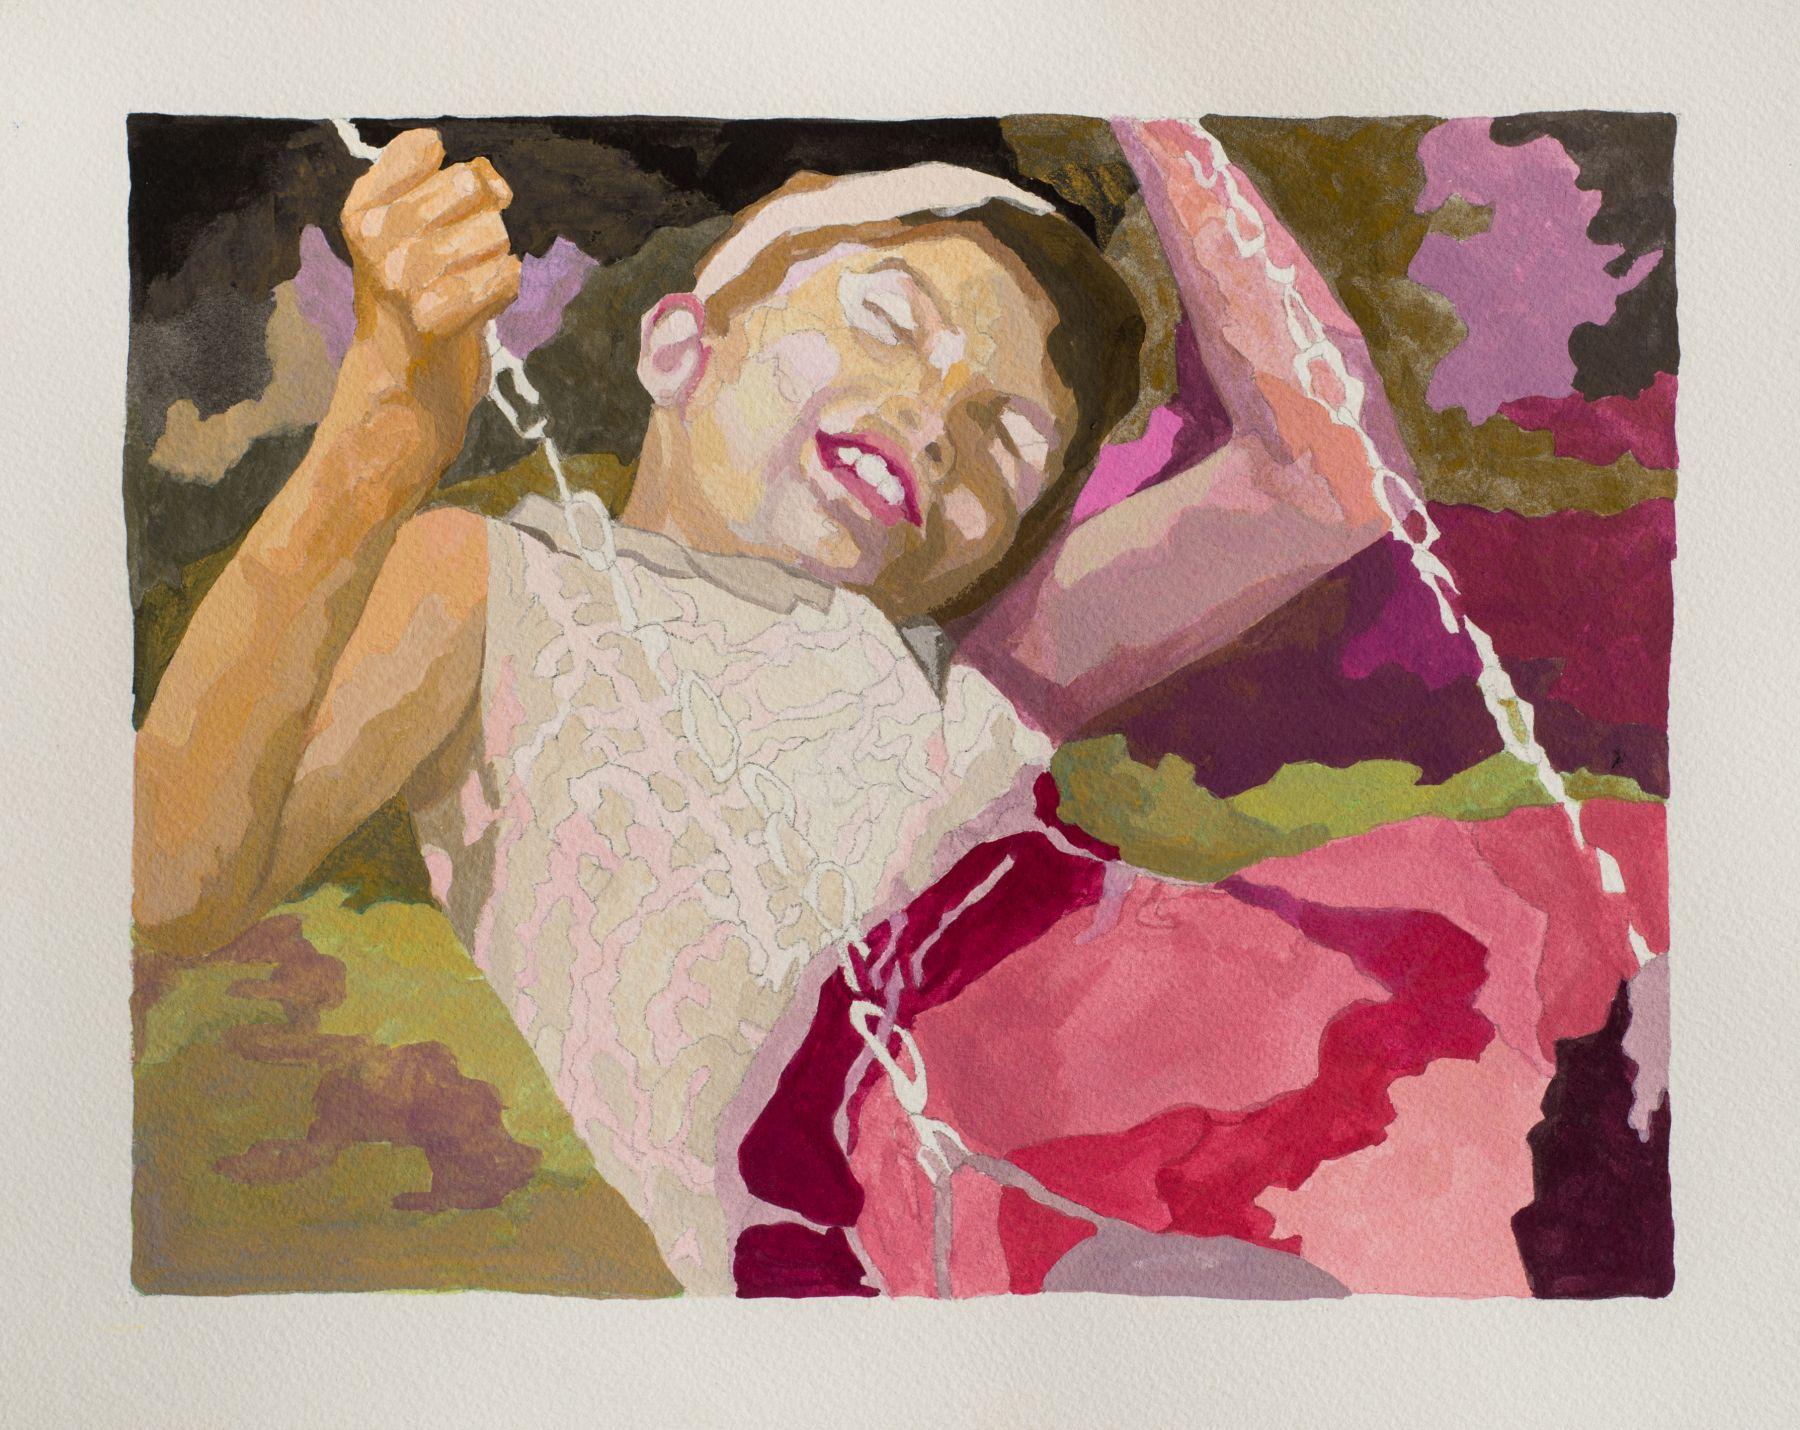 RUTH OWENS, Swingtime, study, 2018